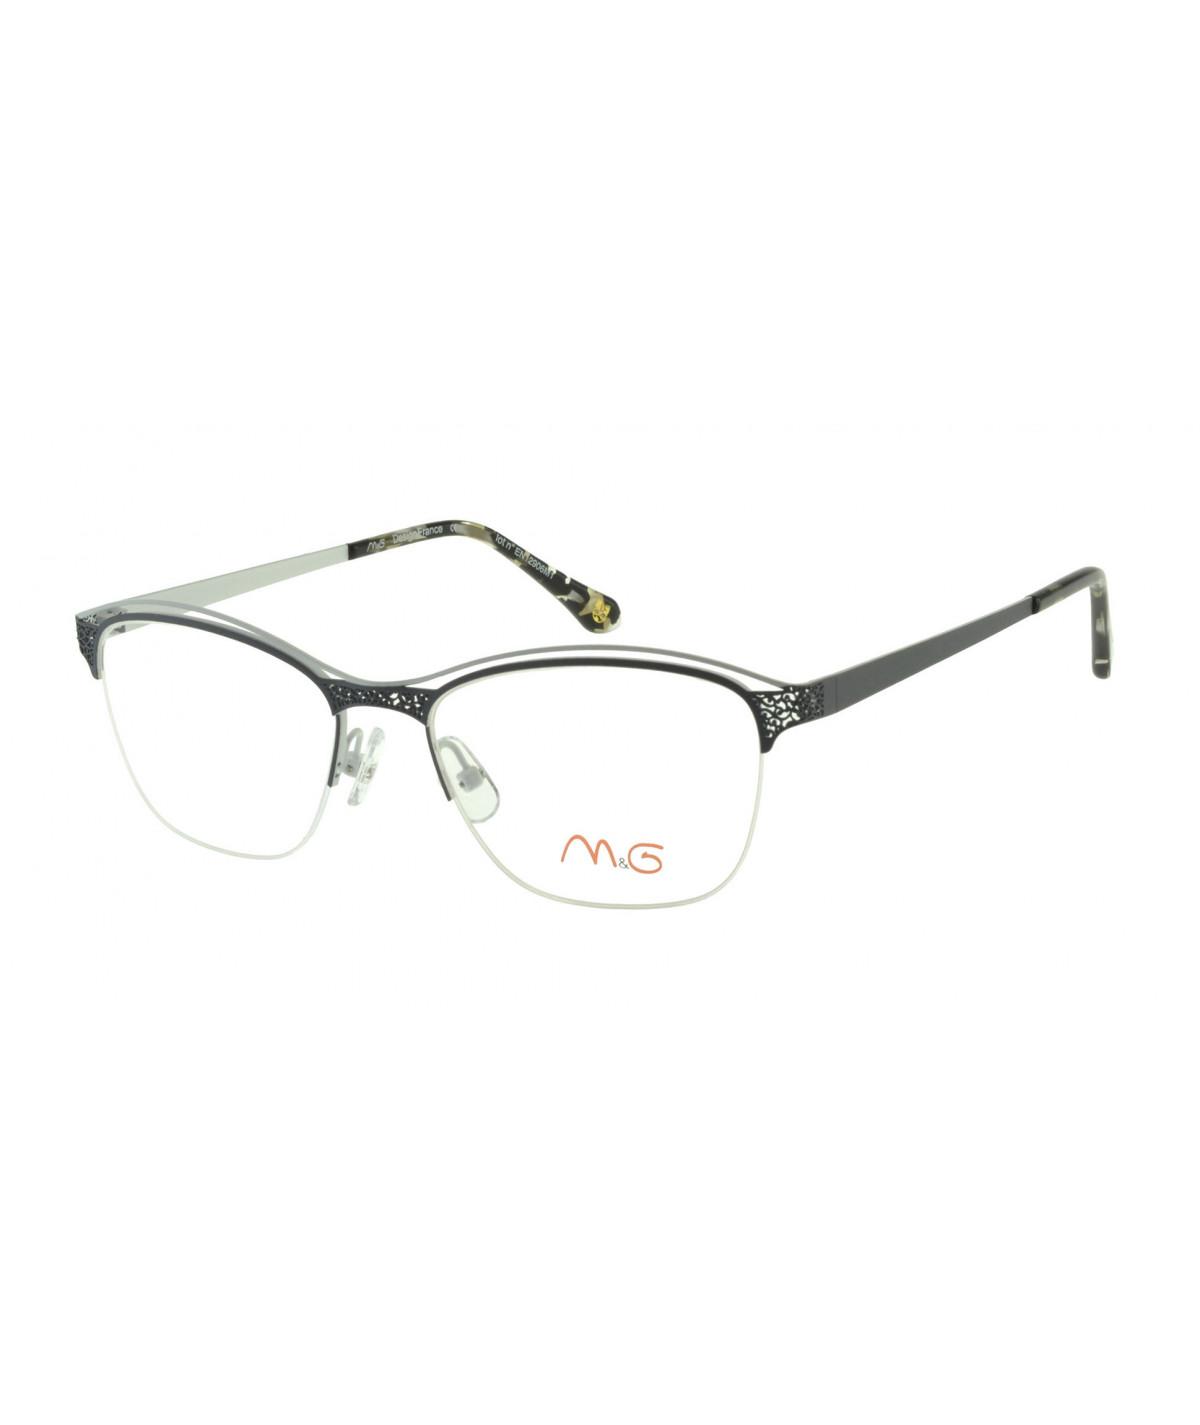 MG911_1